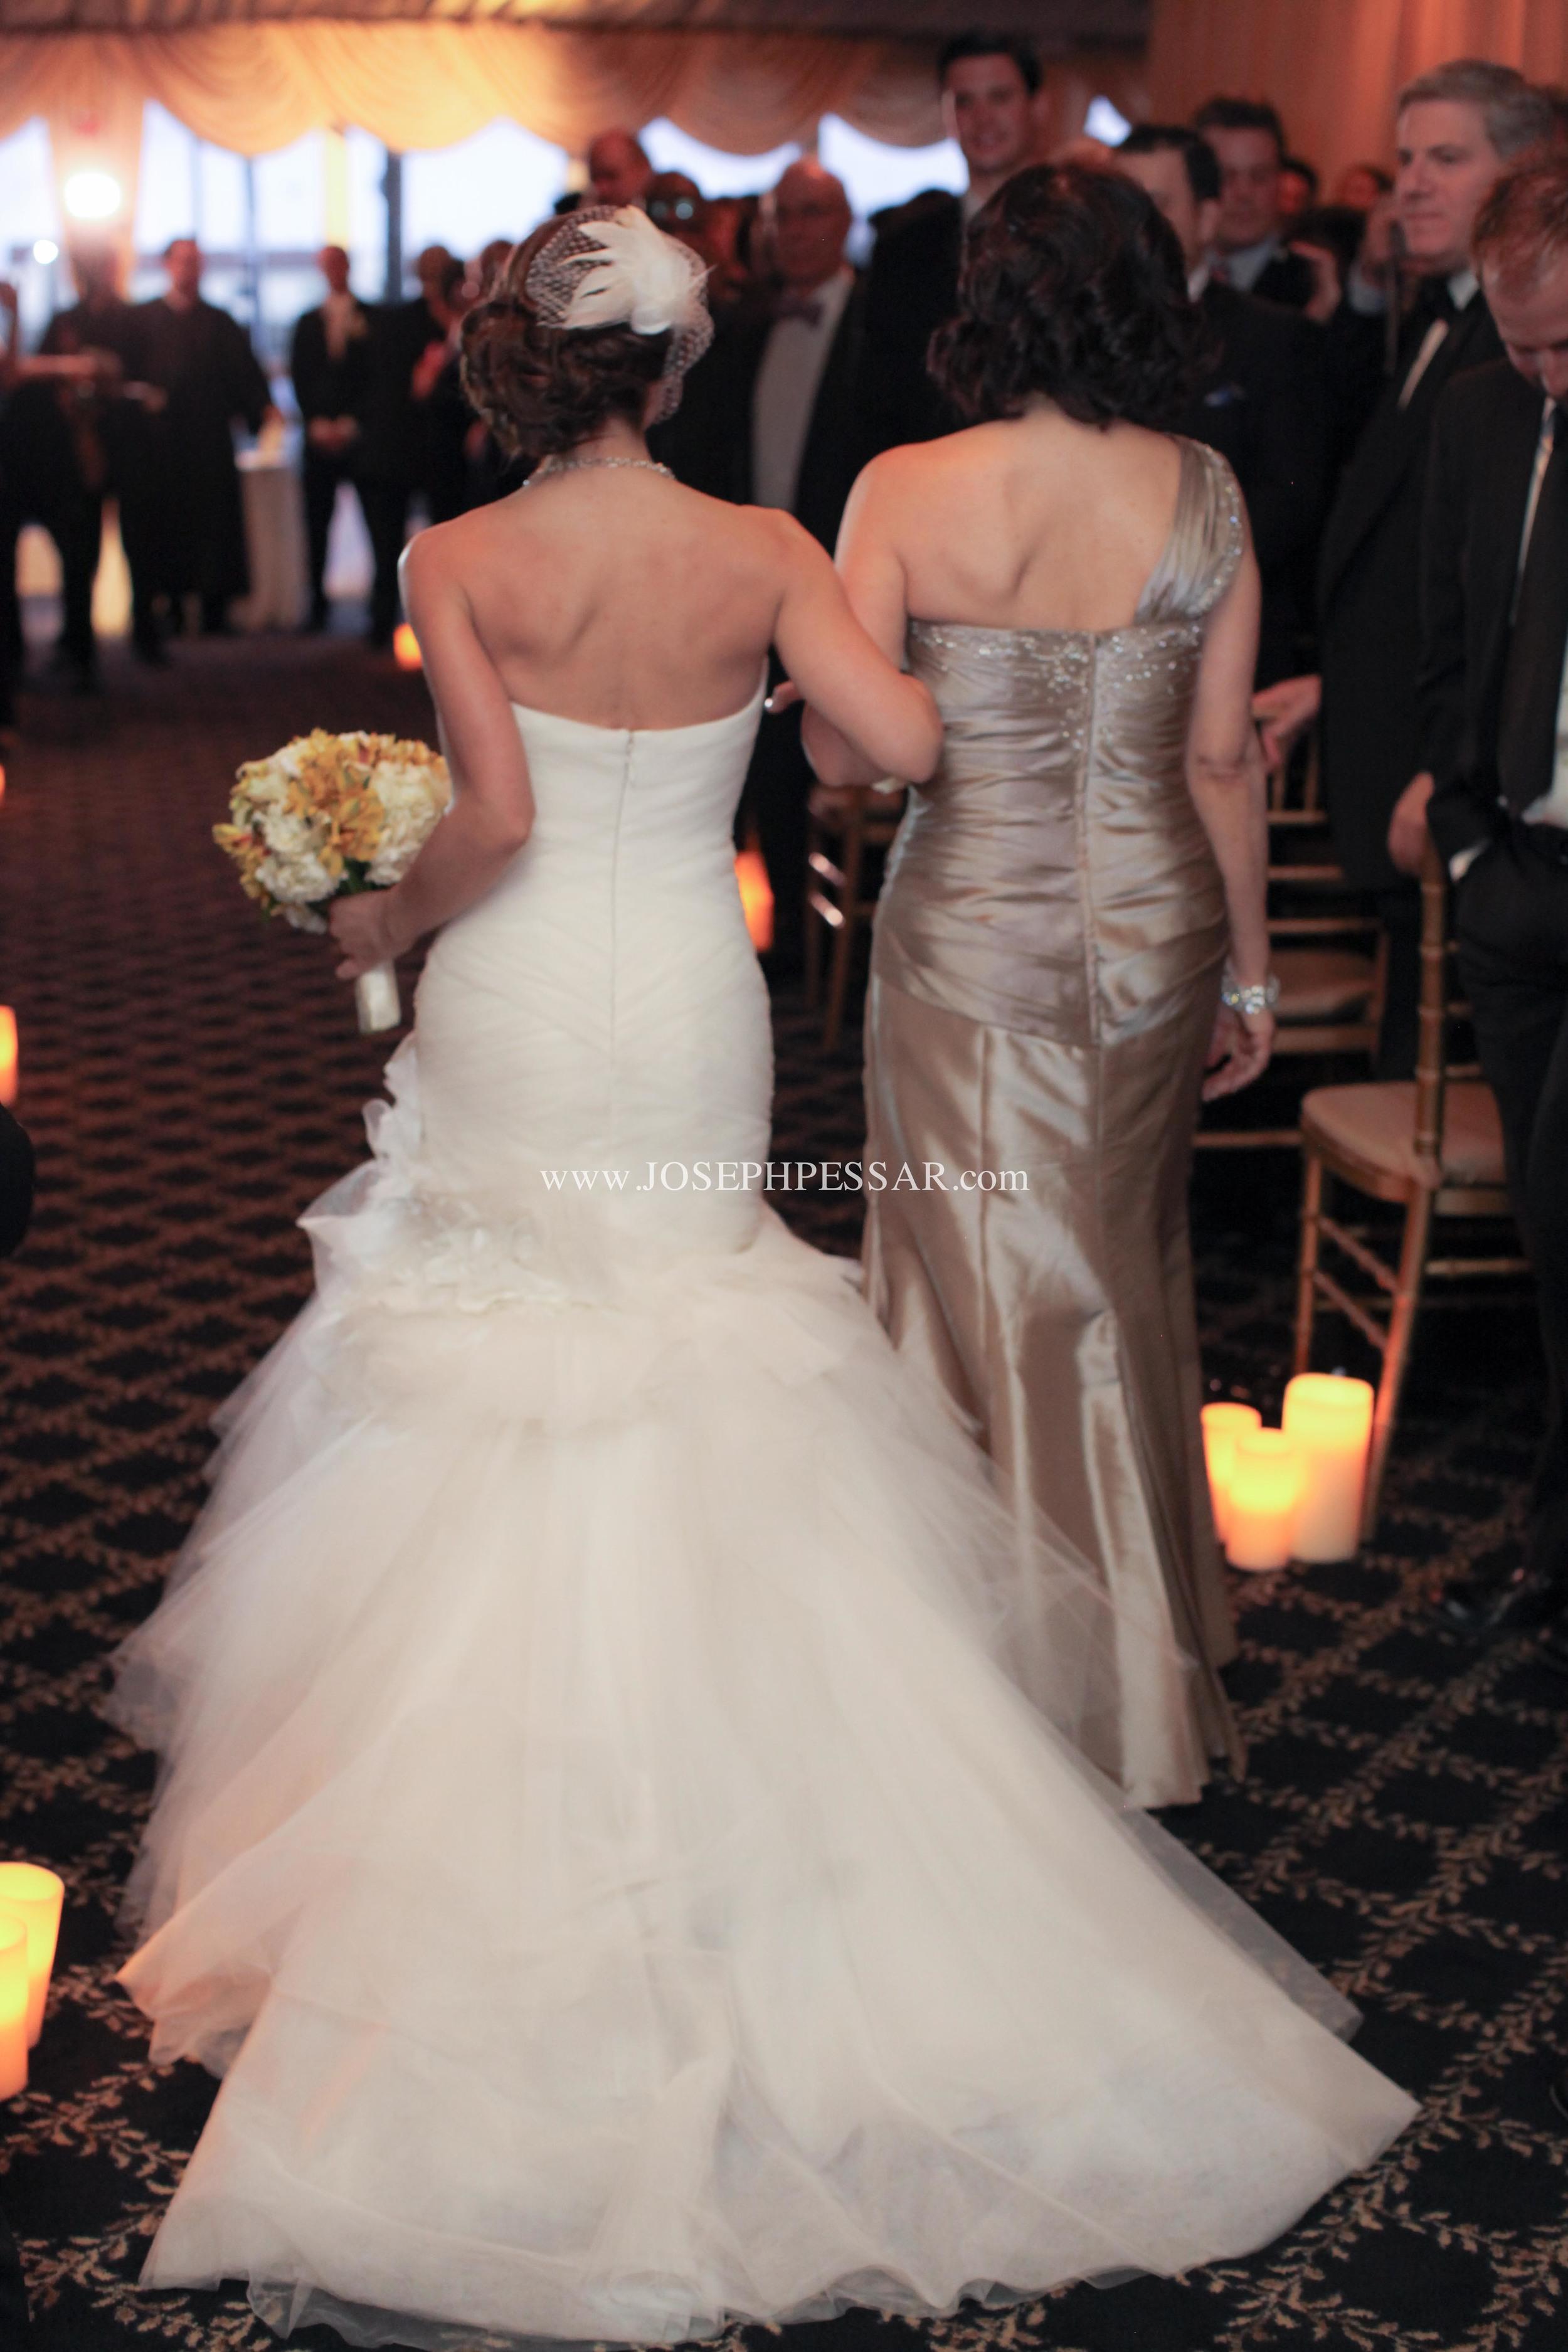 nyc_wedding_photographer0033.jpg